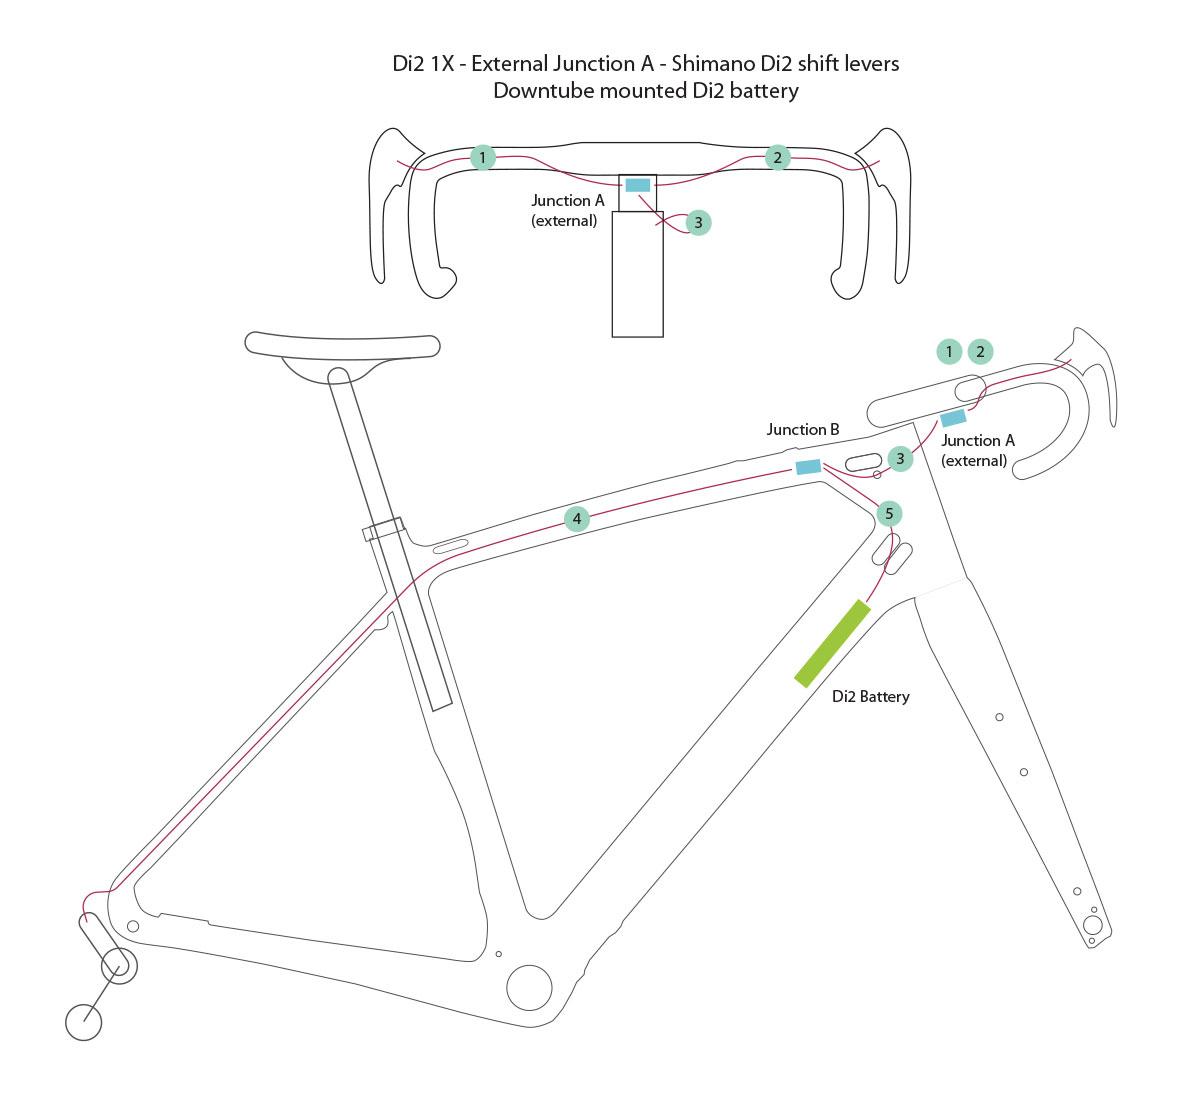 Shimano Di2 Internal Wiring Diagram  Bb30 Diagram, Shimano Ultegra